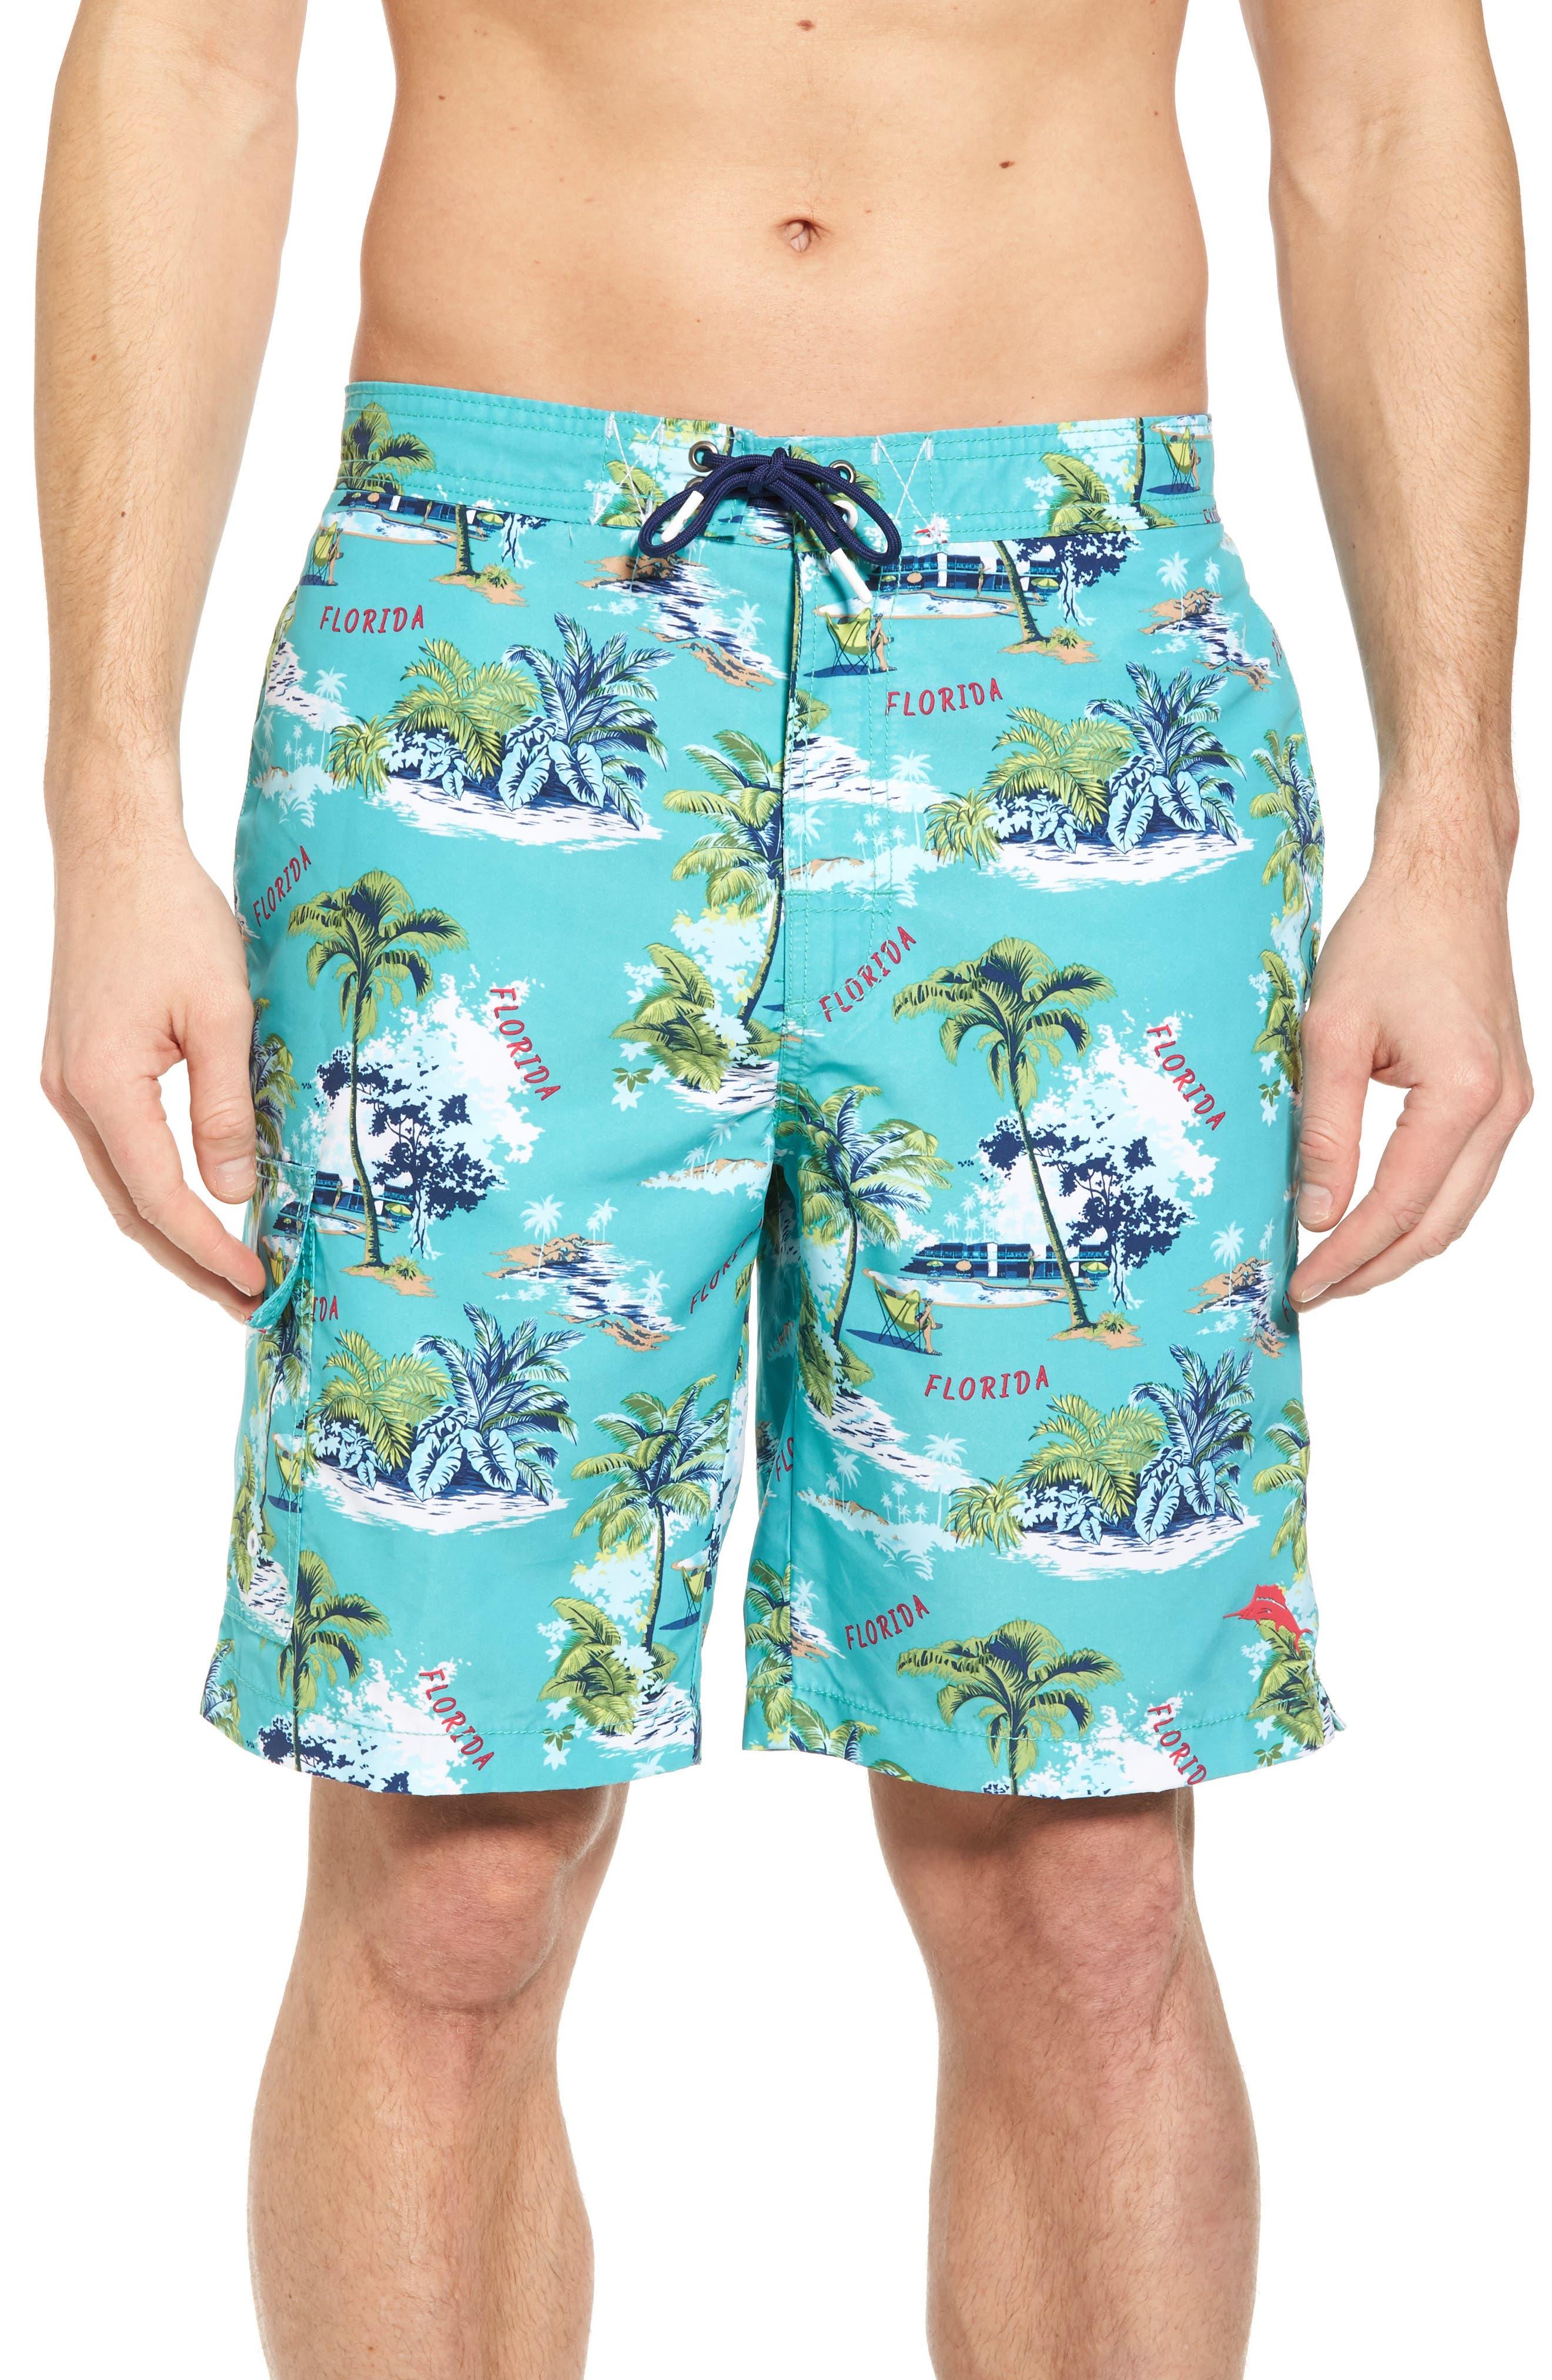 Tommy Bahama Baja Destination Florida Swim Trunks